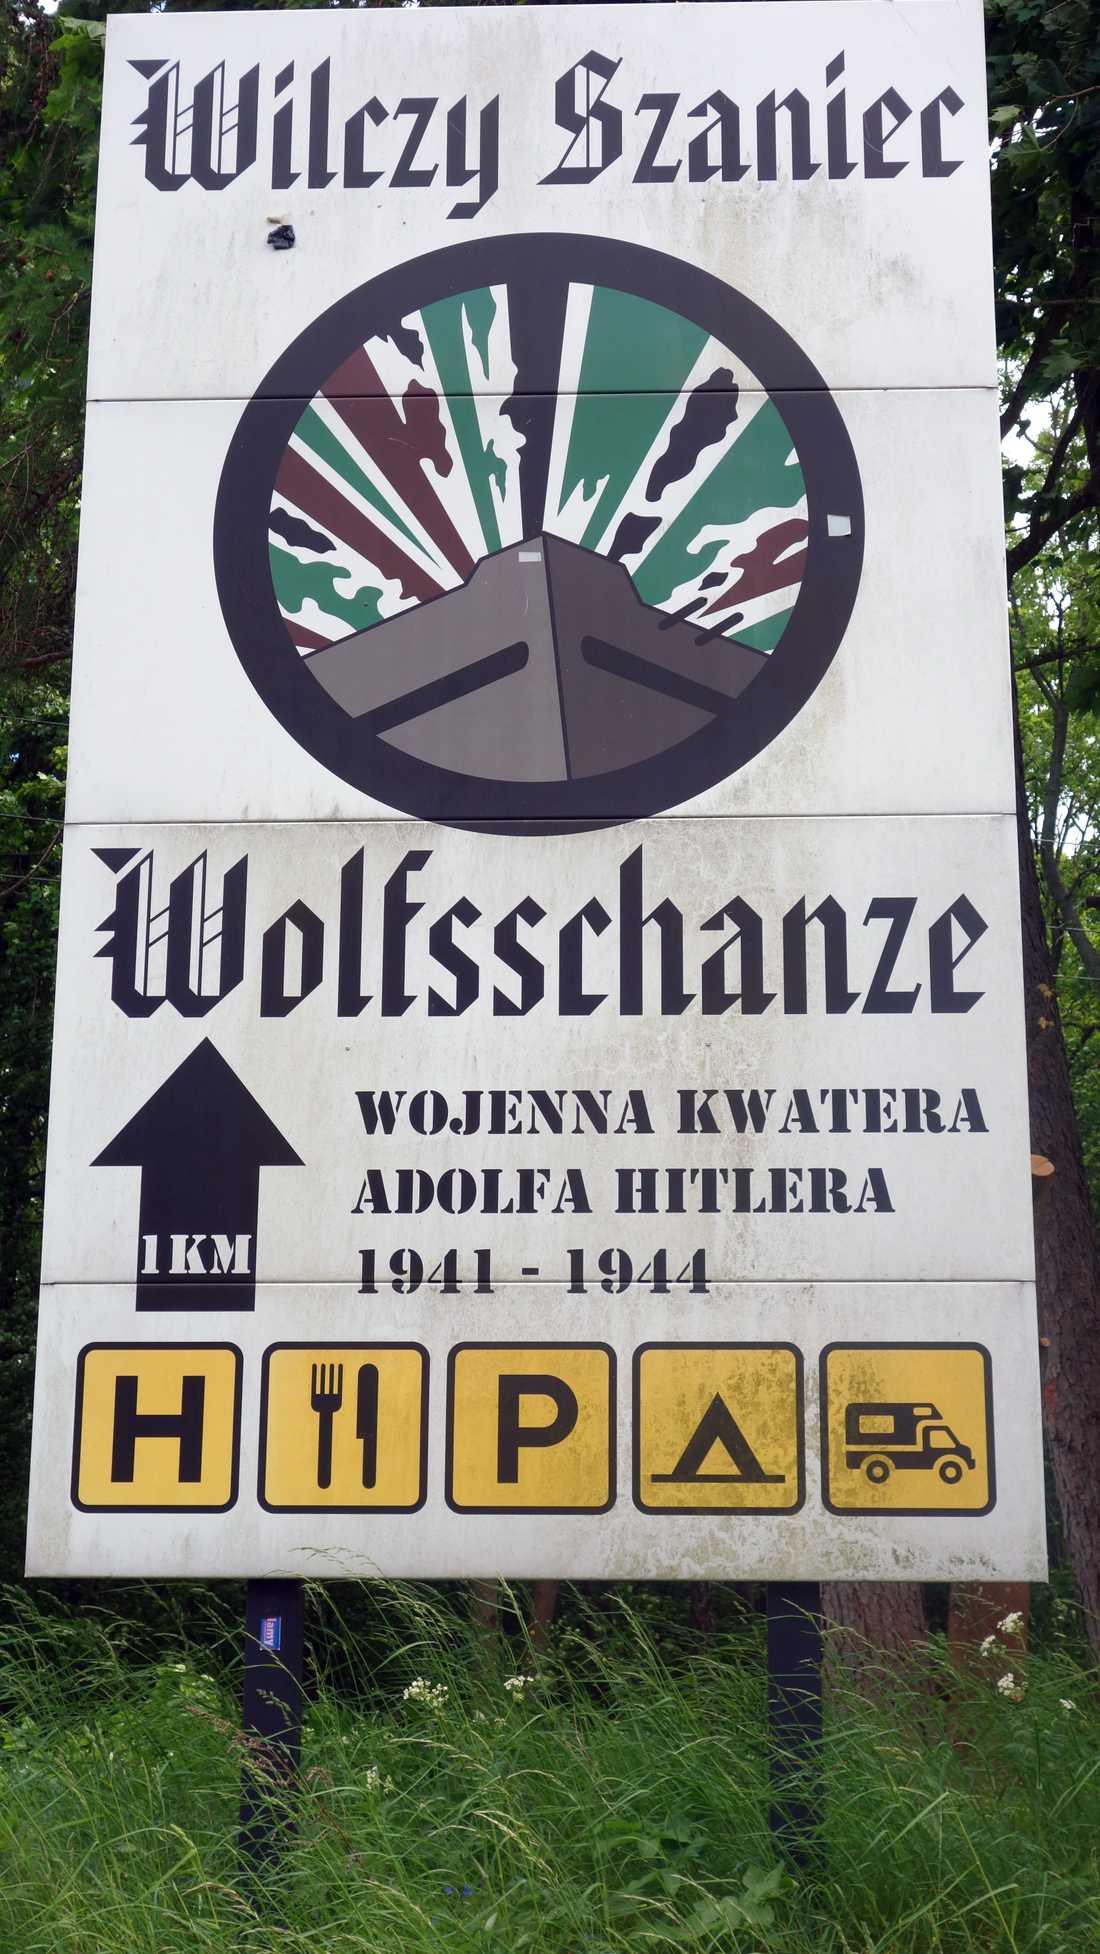 Strax bakom skylten finner man ruinerna från Hitlertysklands bunkerkomplex Wolfensschanze.